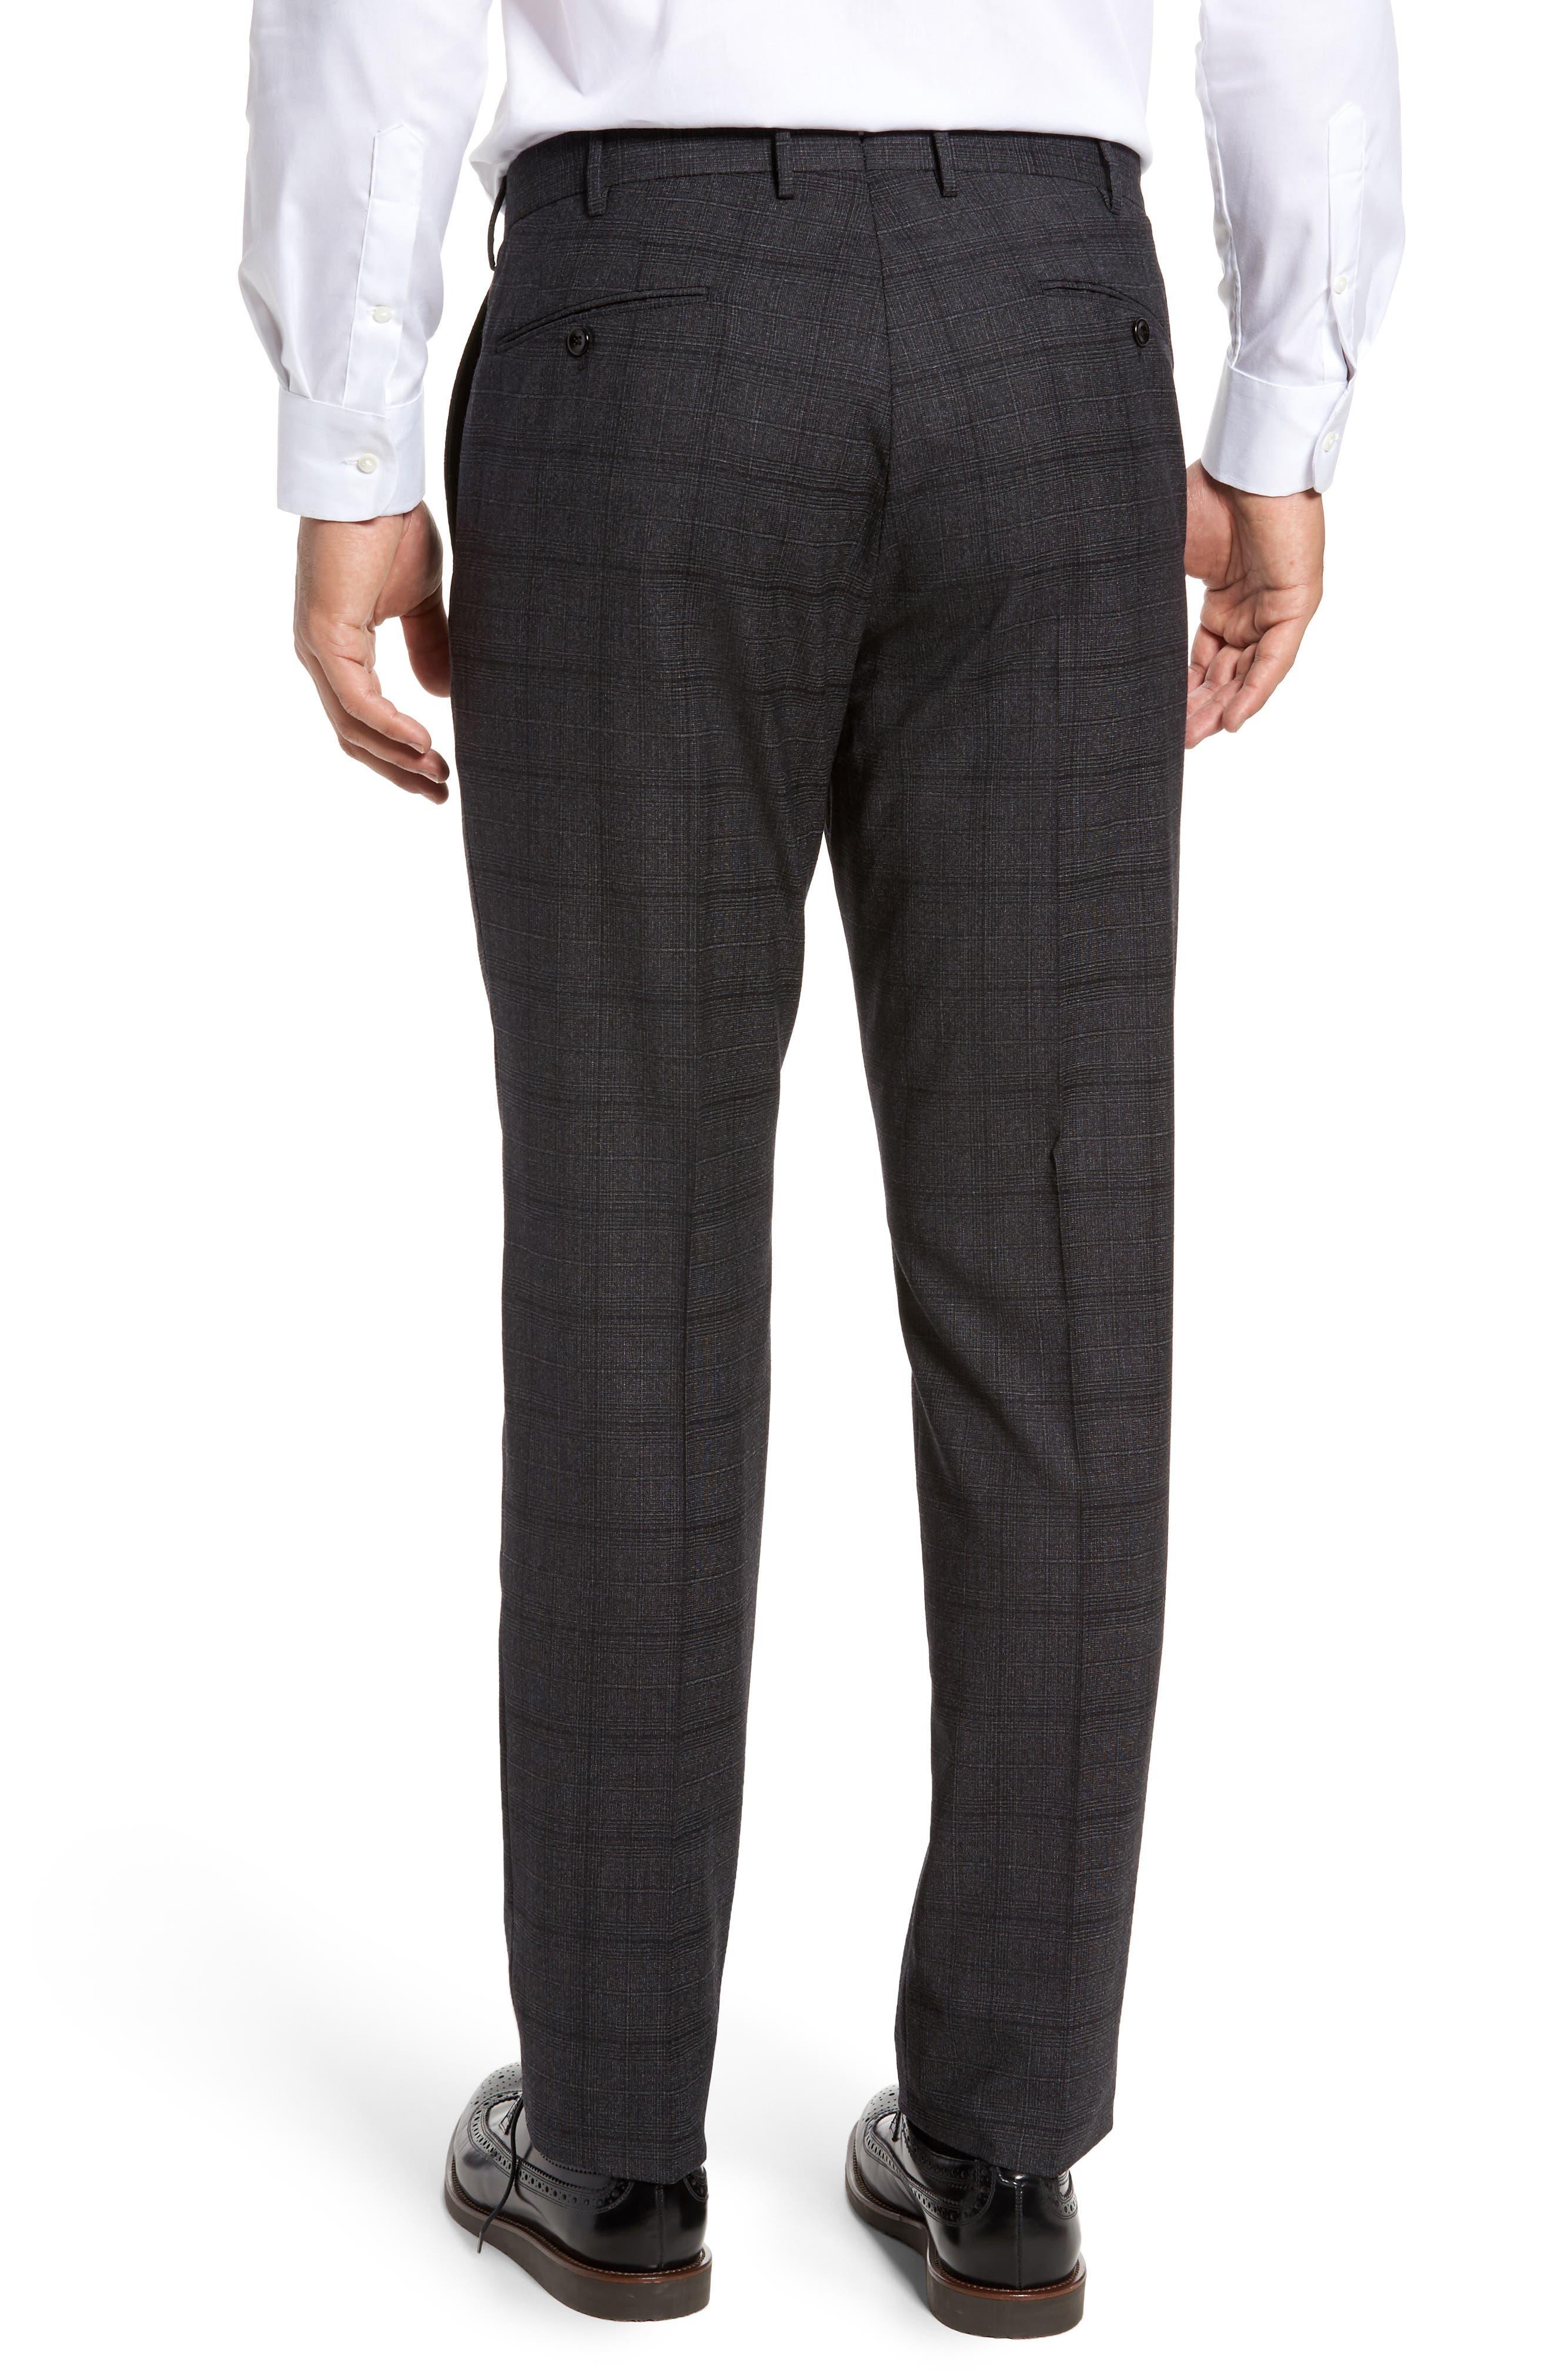 Benson Flat Front Trousers,                             Alternate thumbnail 3, color,                             015